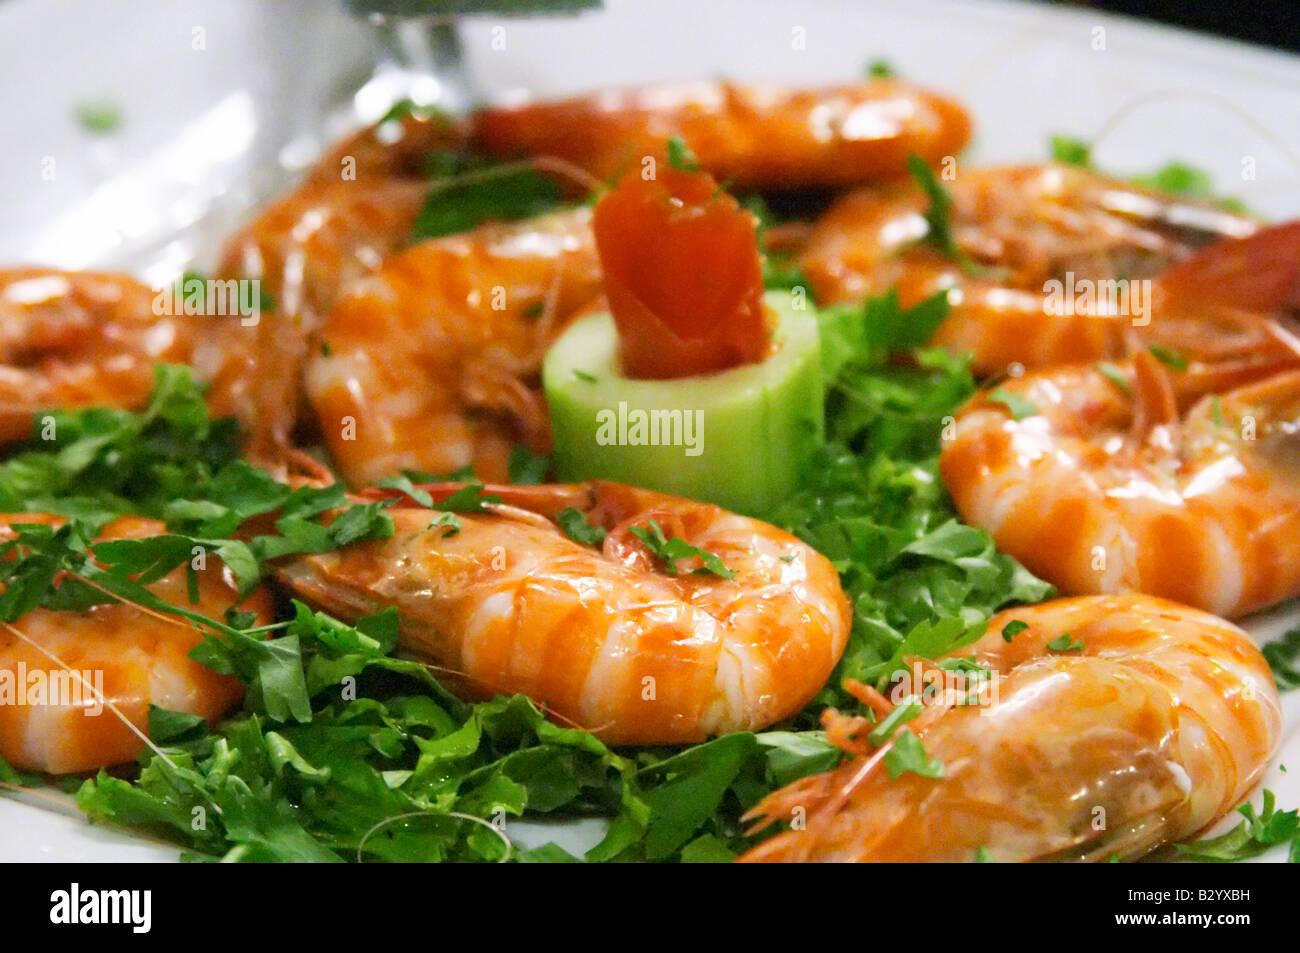 Shrimps. Restaurant Berdema Ton Gefseon. Drama, Macedonia, Greece - Stock Image